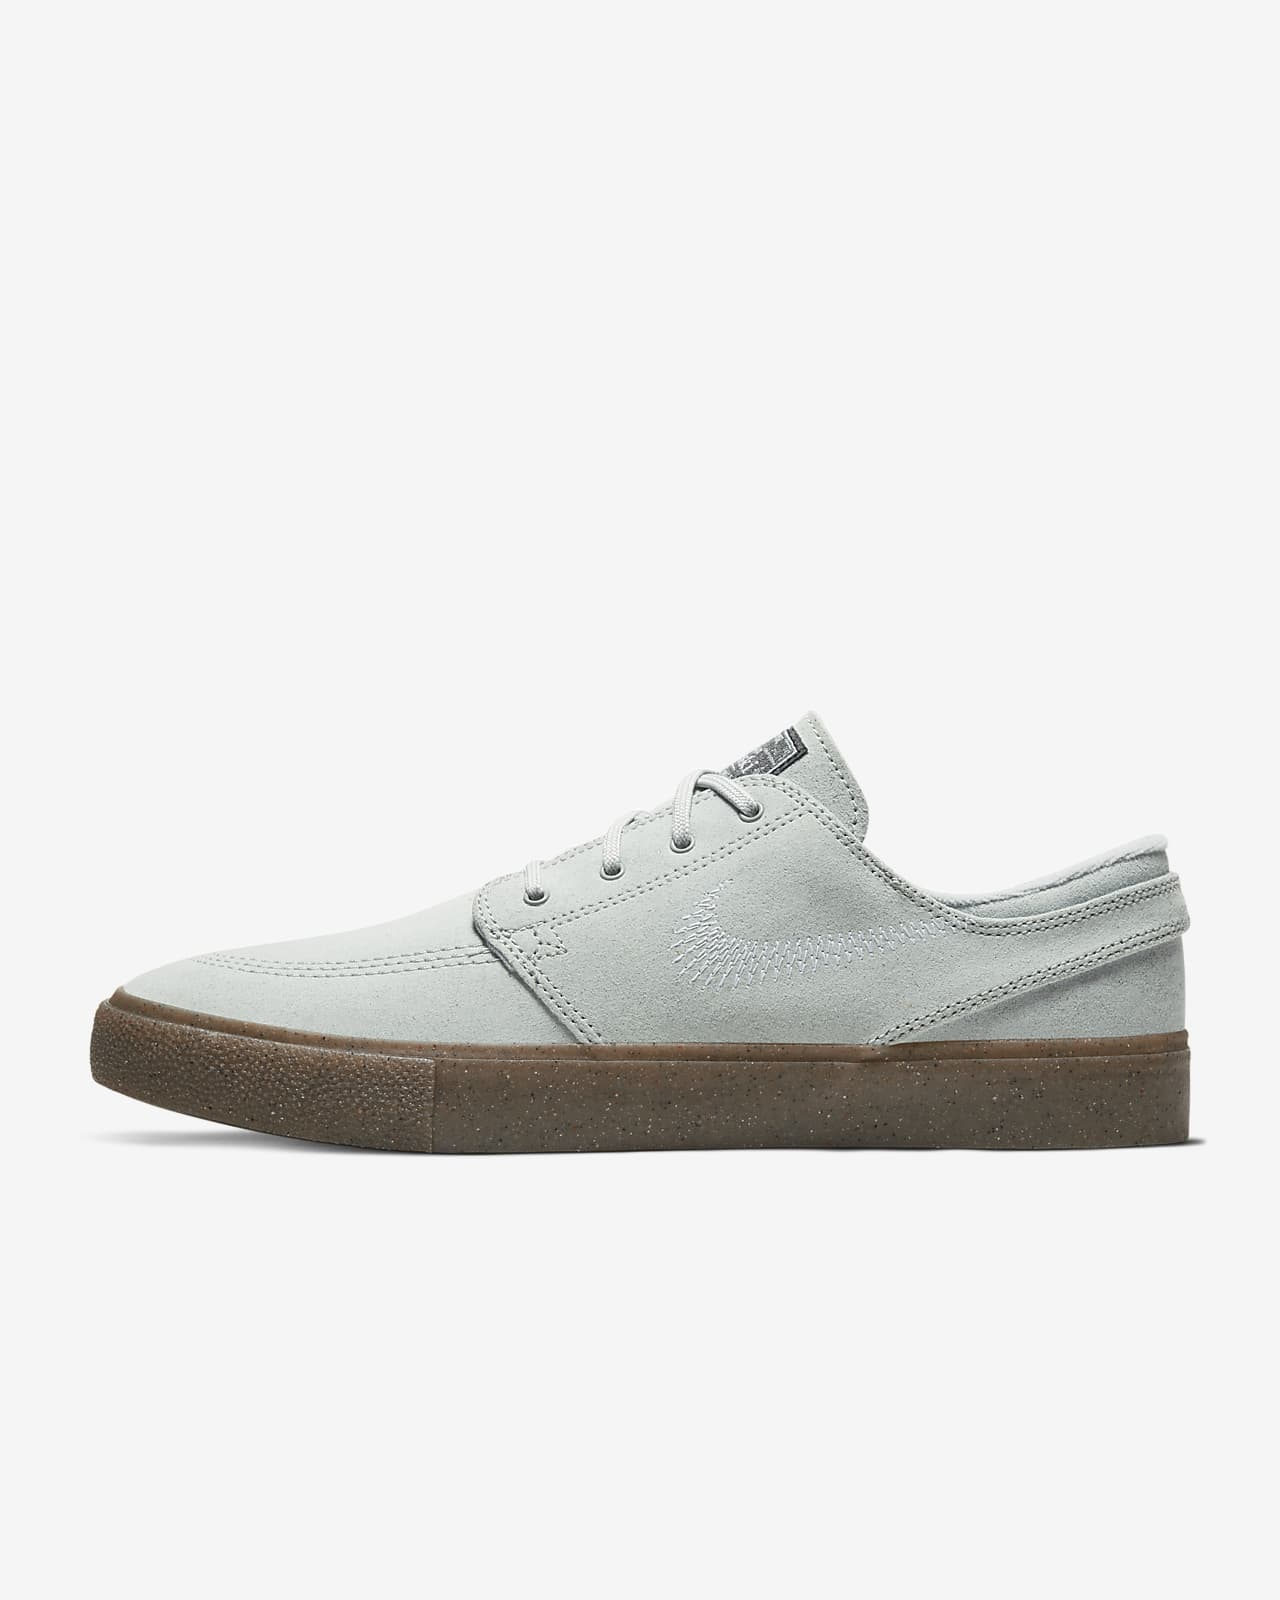 Sapatilhas de skateboard Nike SB Zoom Stefan Janoski FL RM